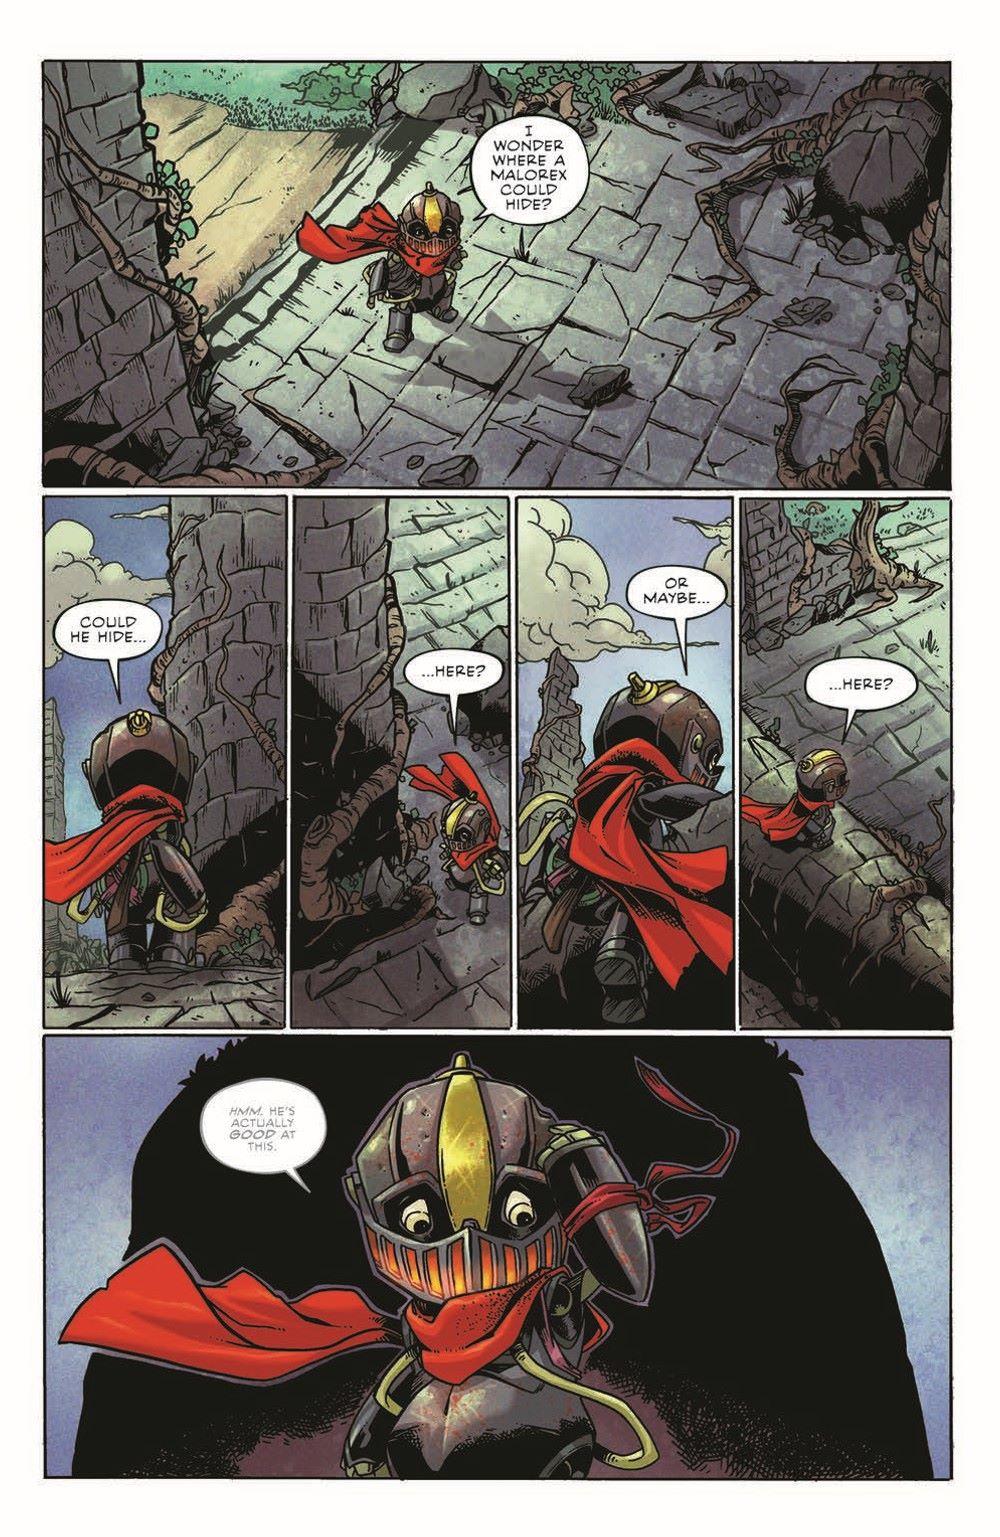 CANTOTPB02_pr-5 ComicList Previews: CANTO II THE HOLLOW MEN TP